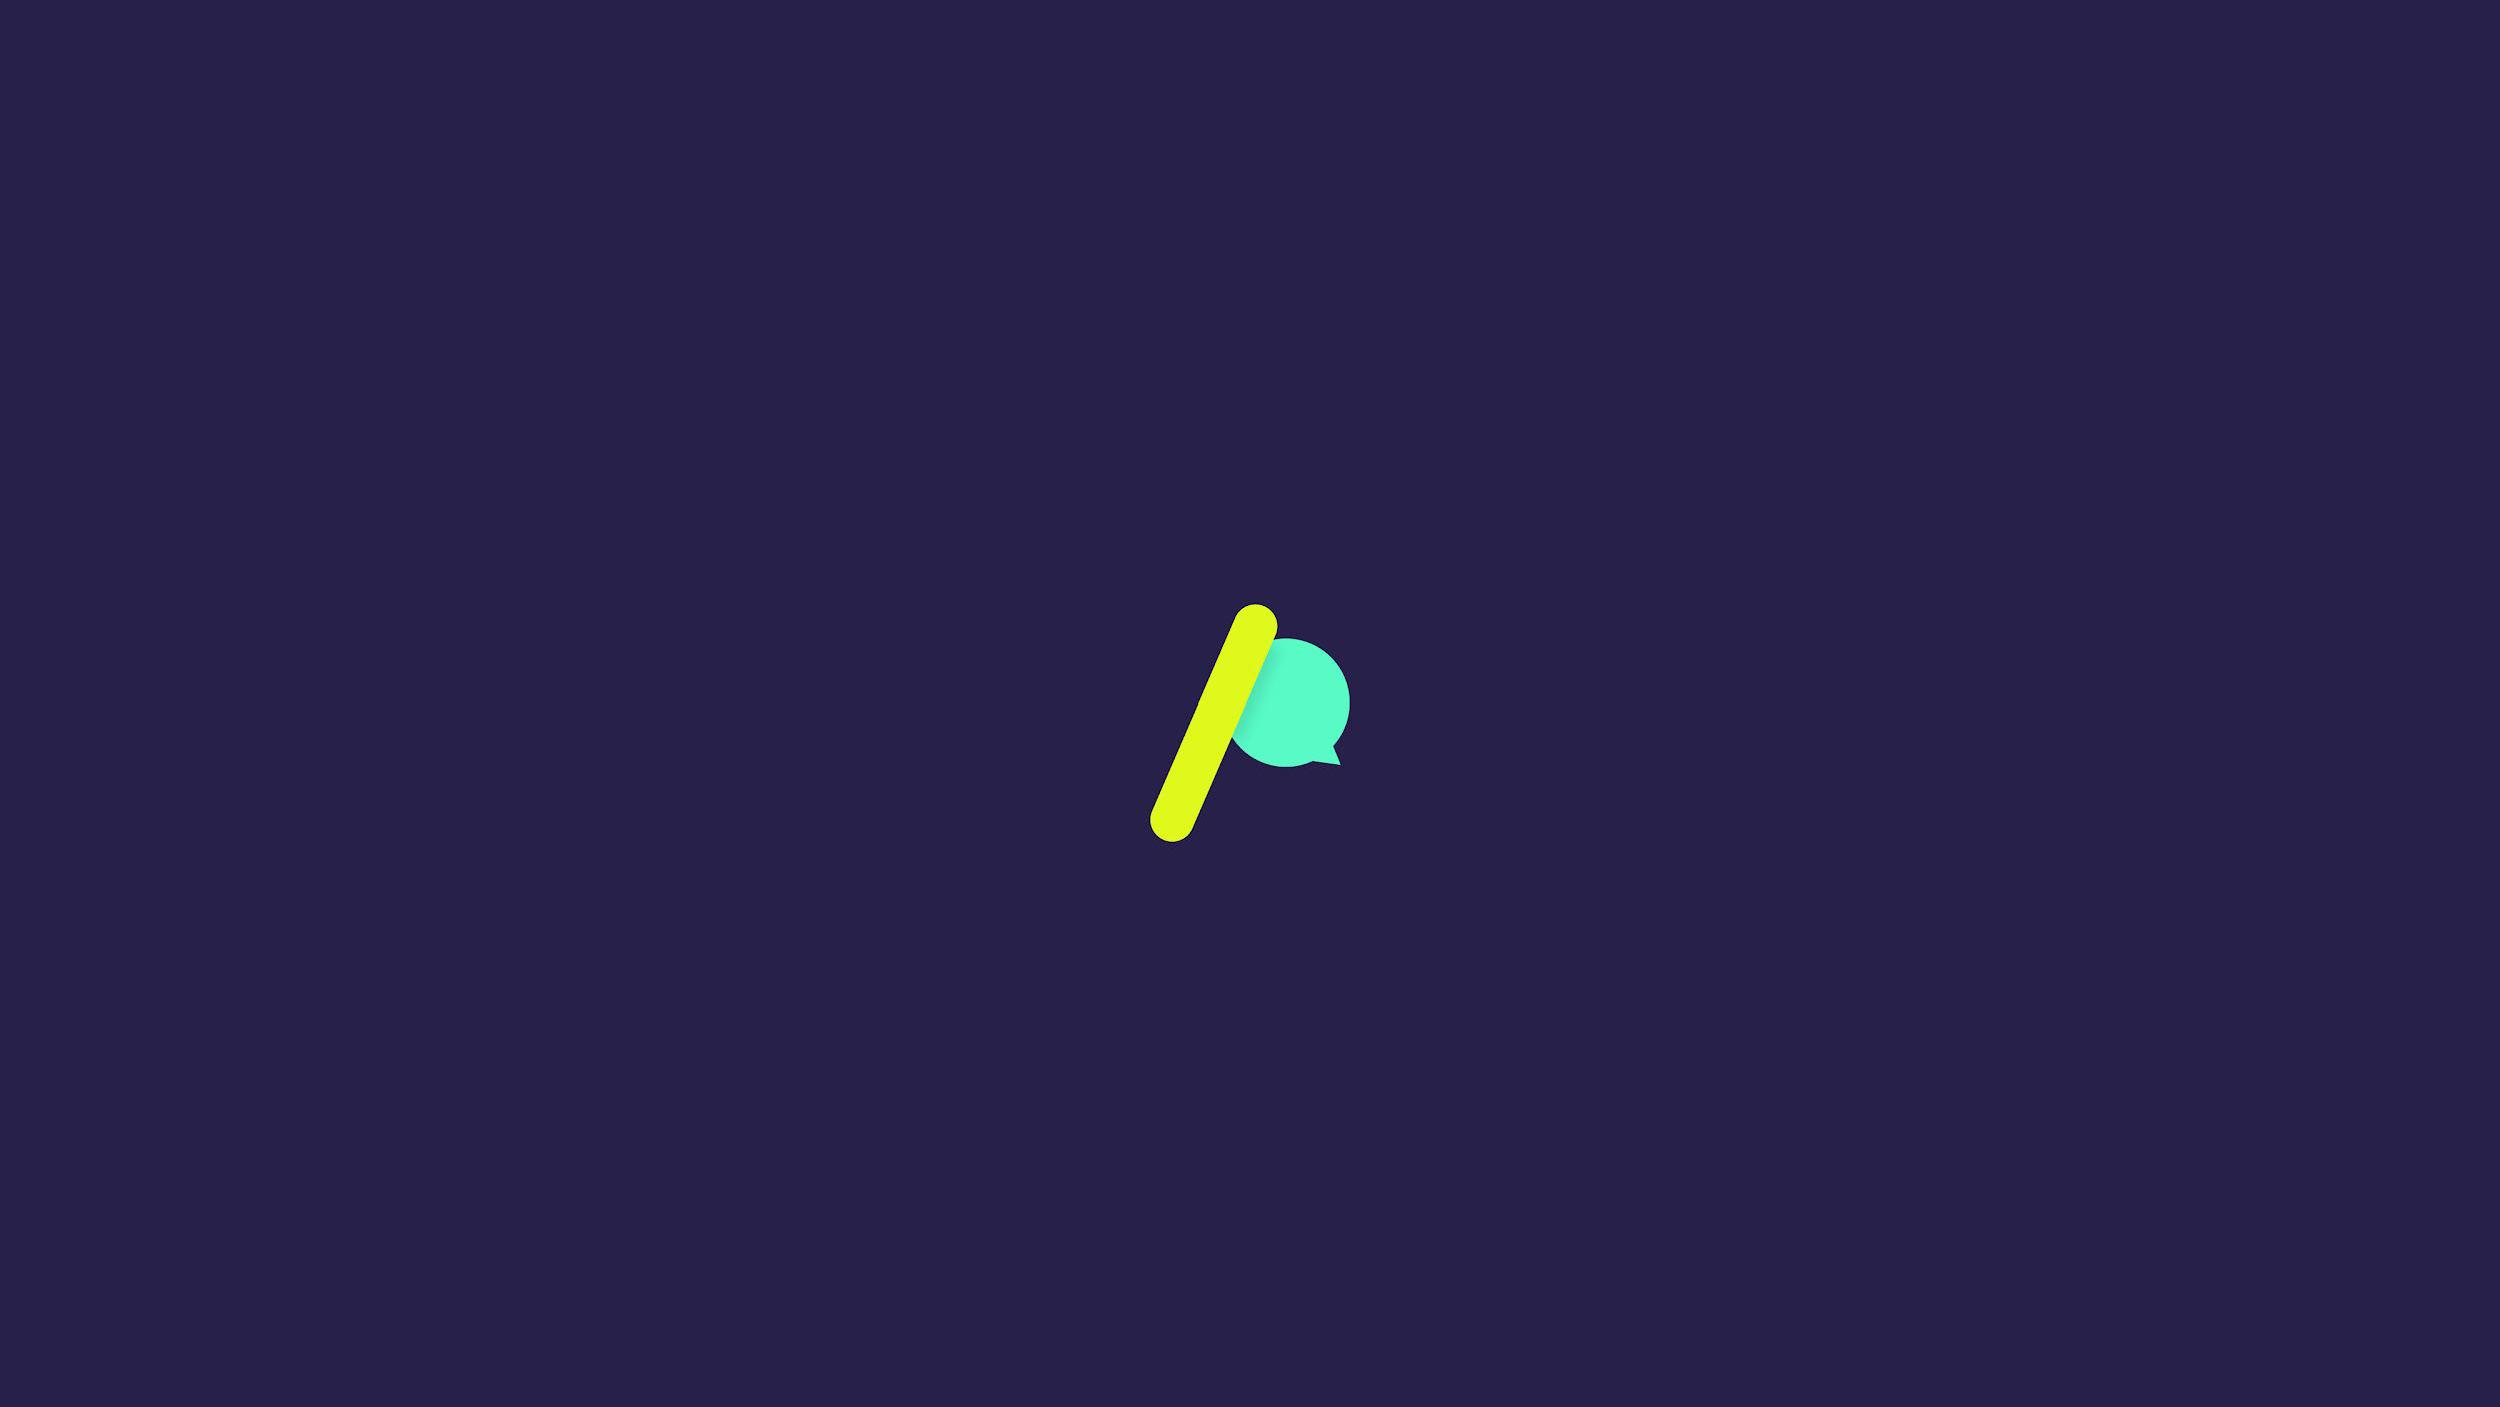 Pheo_process_Page_42.jpg